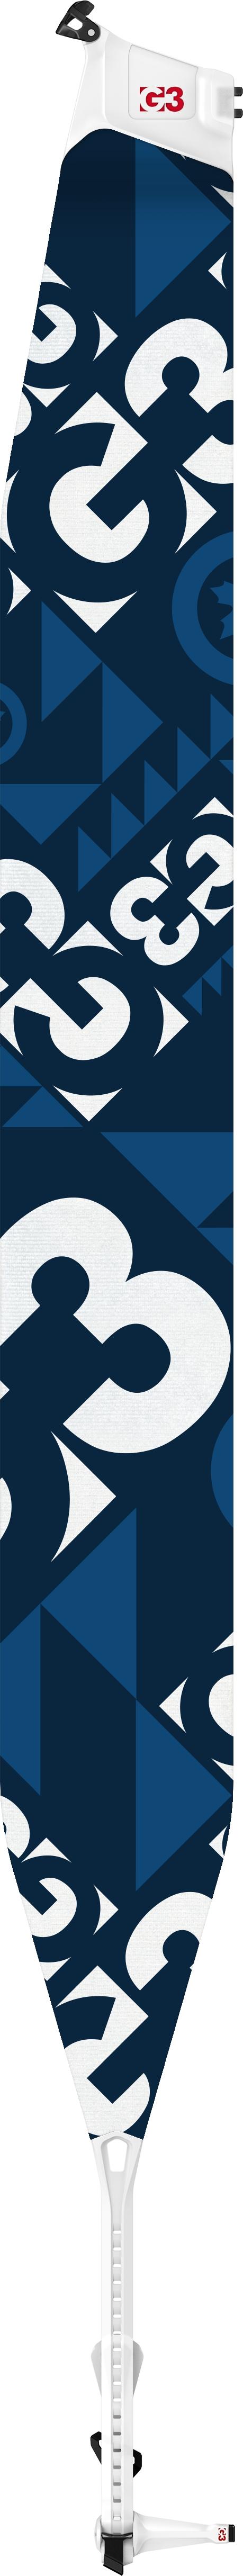 SplitGrip_1.jpg